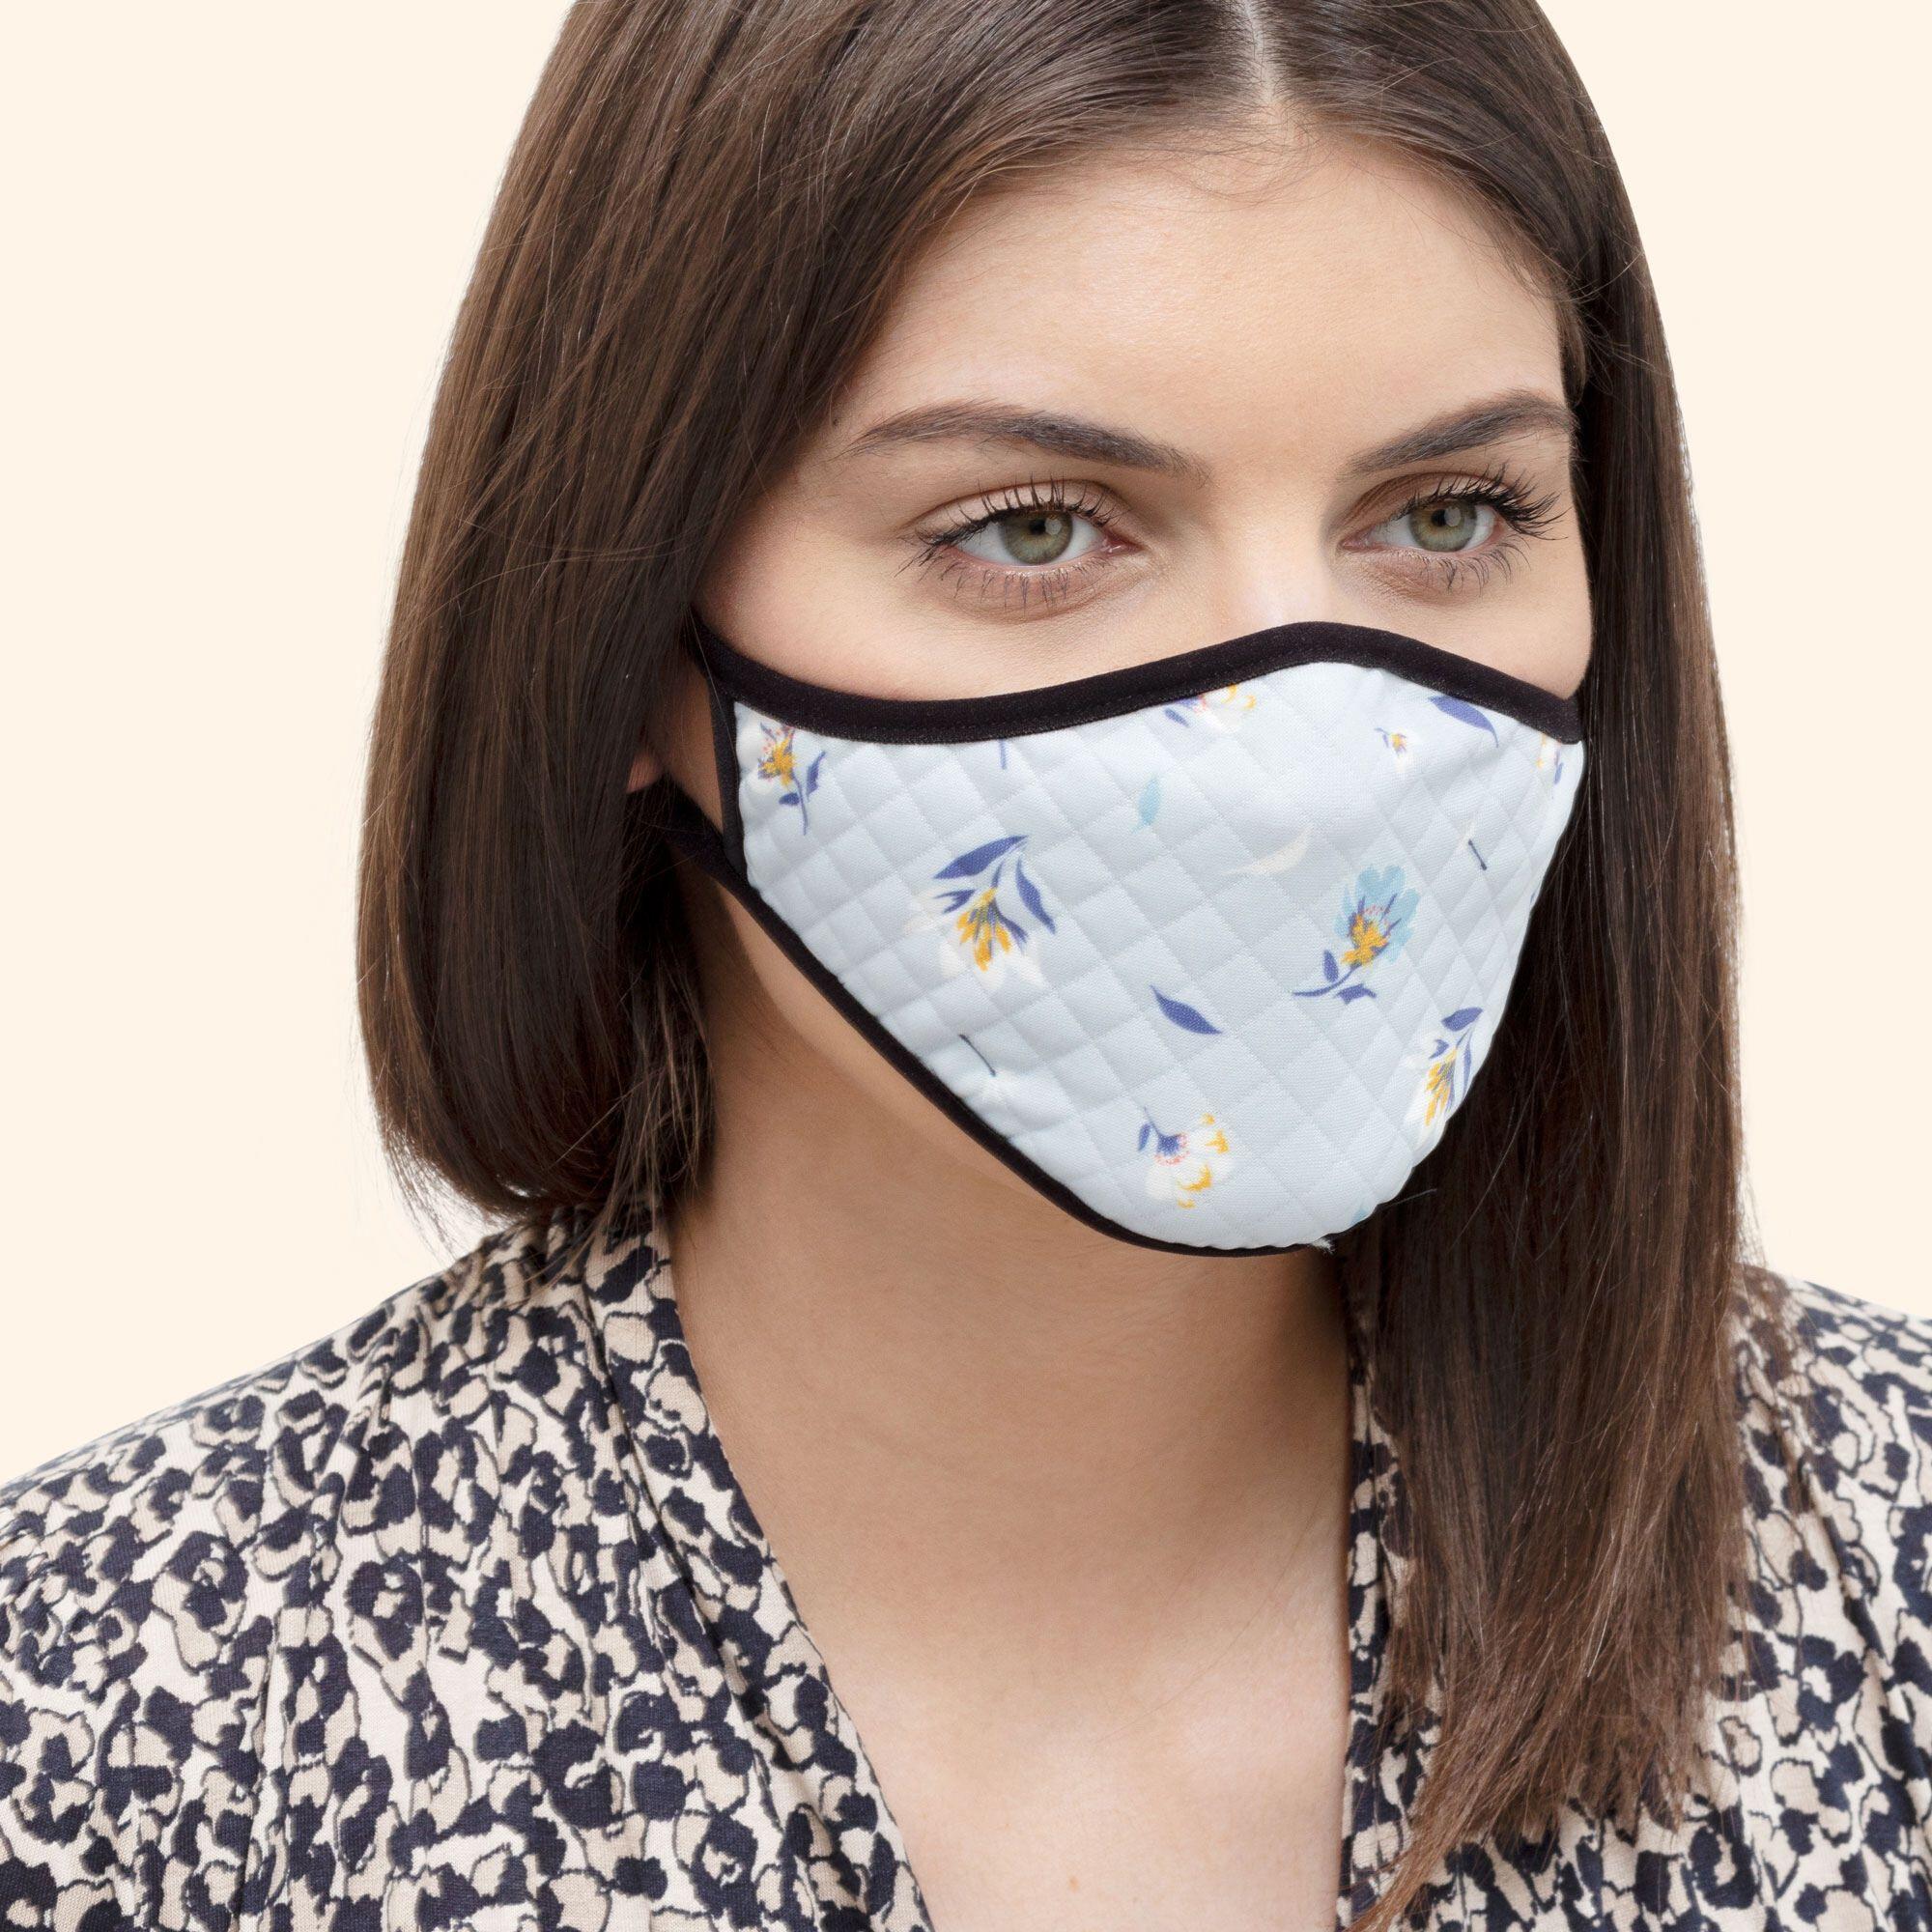 mondkapjes ontwerpen essentieel accessoire